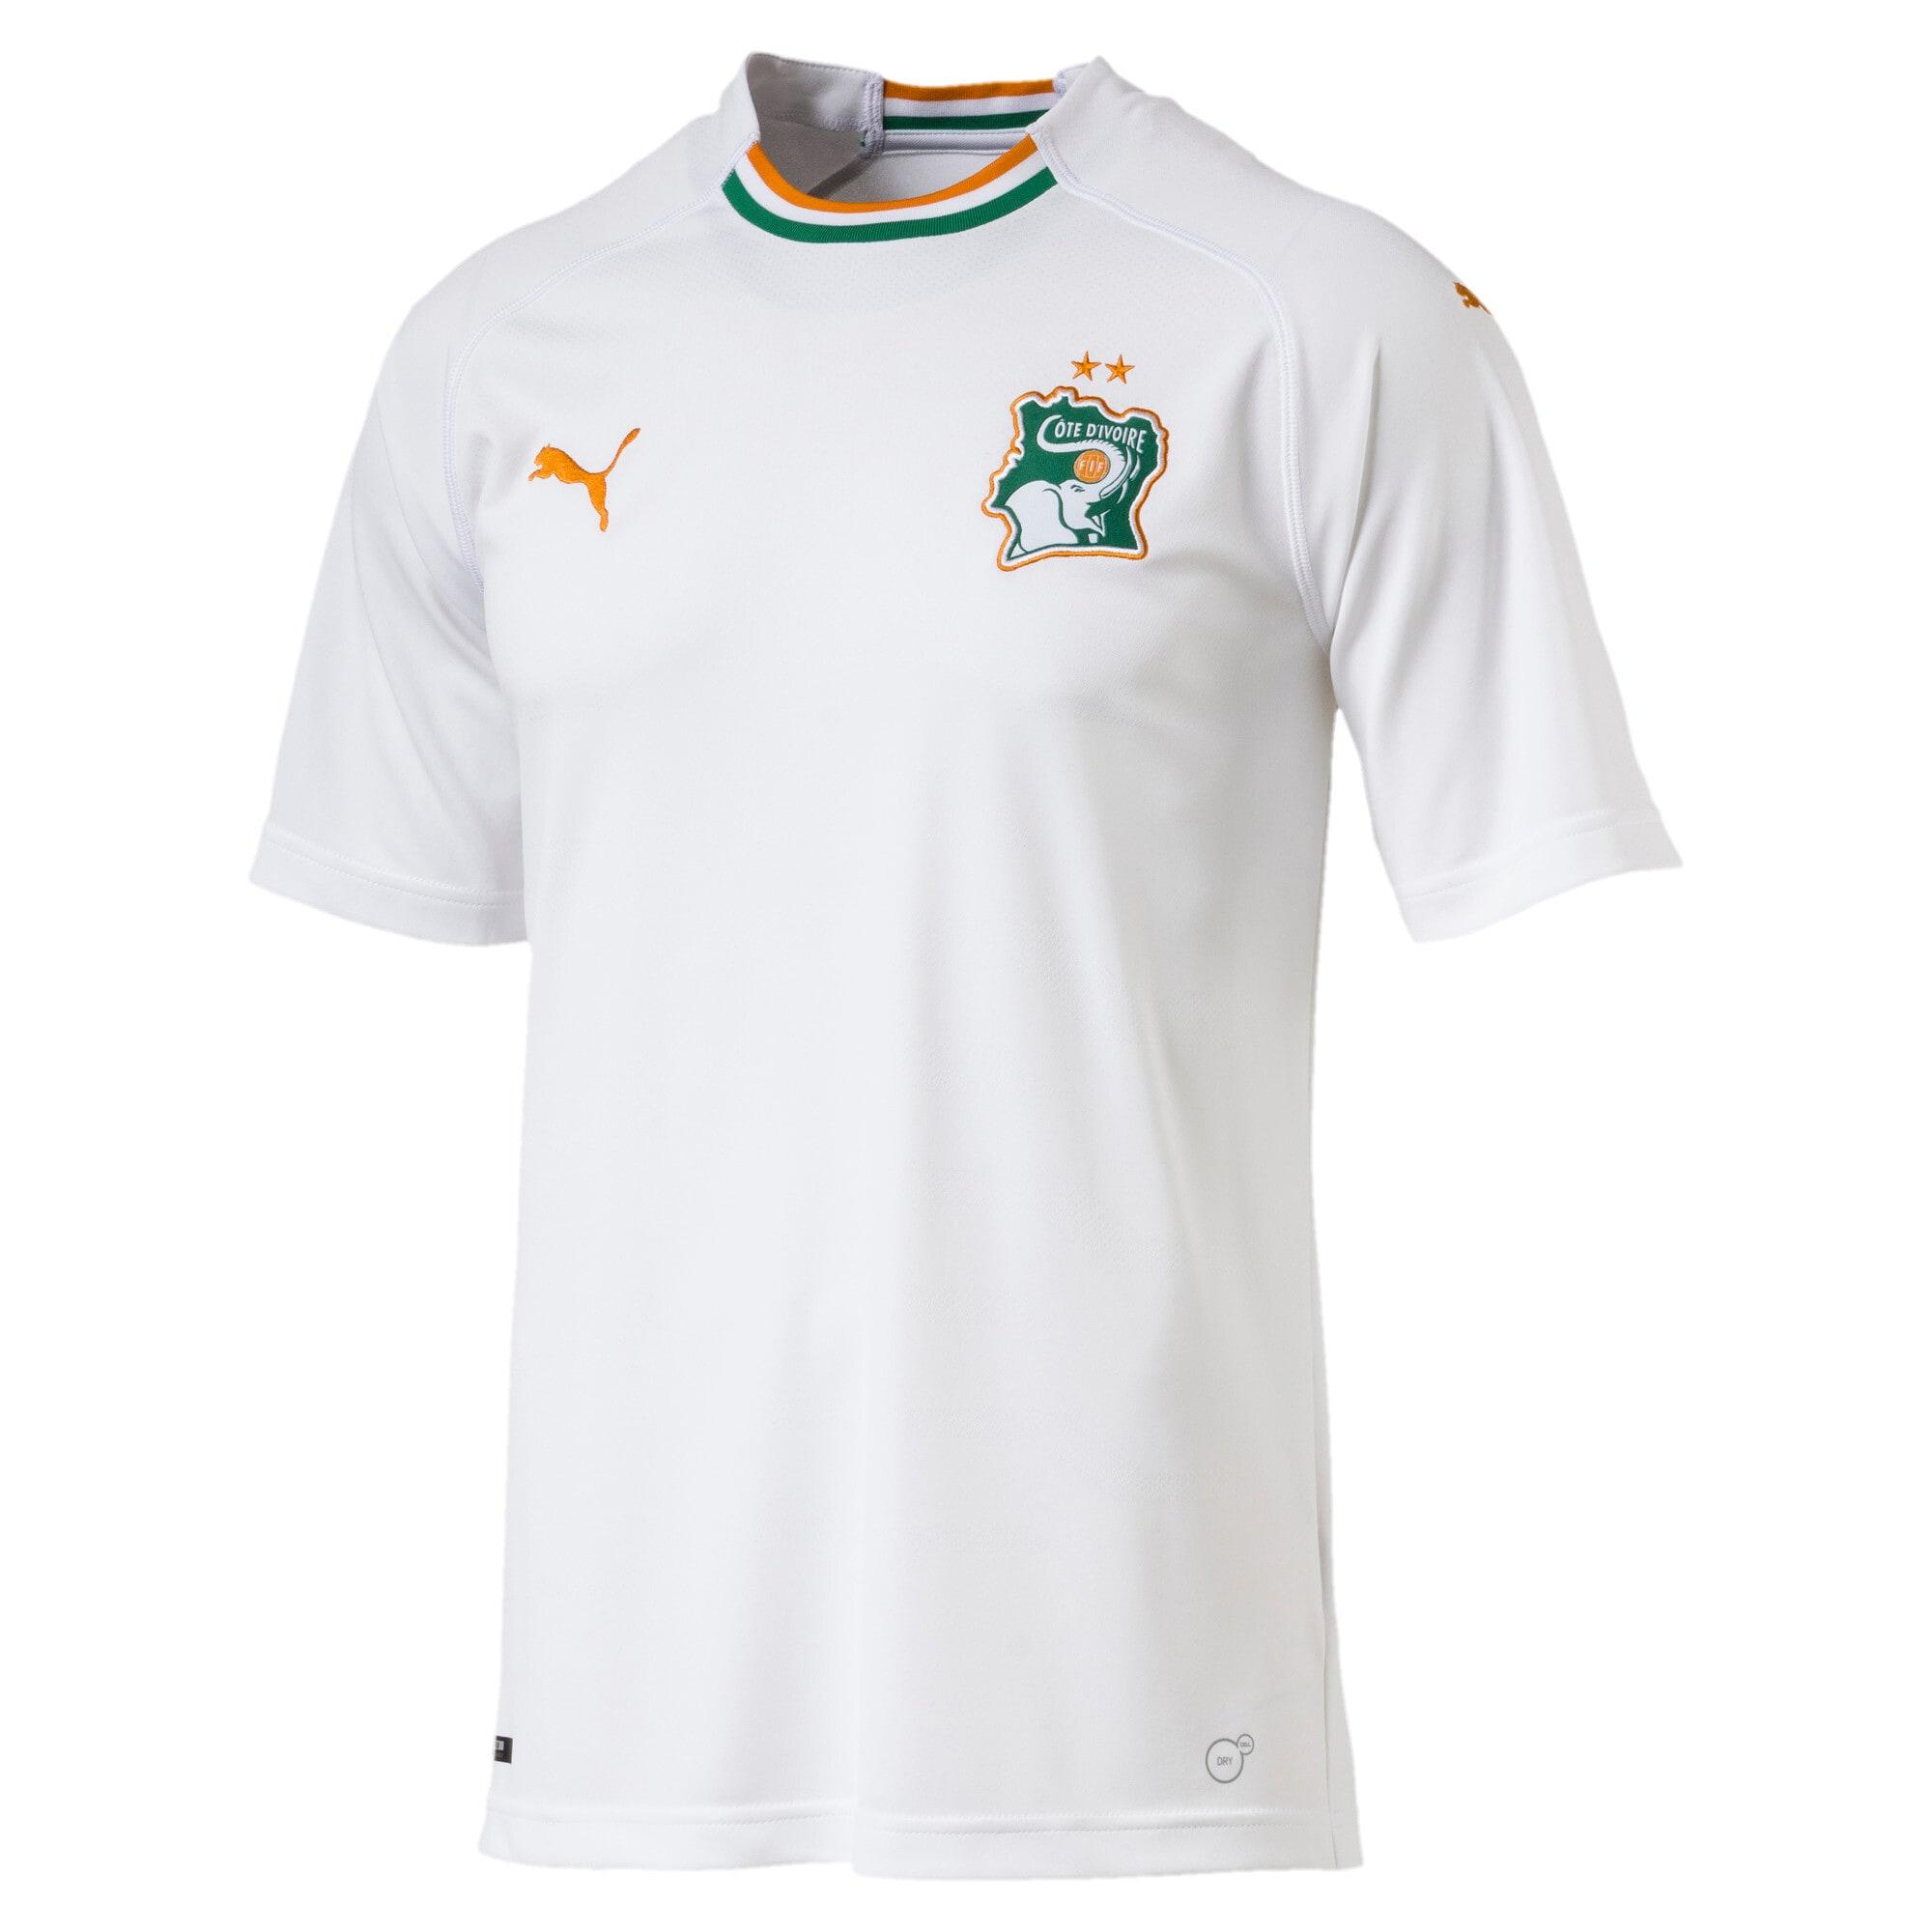 Thumbnail 4 of Ivory Coast Men's Away Replica Jersey, Puma White-Flame Orange, medium